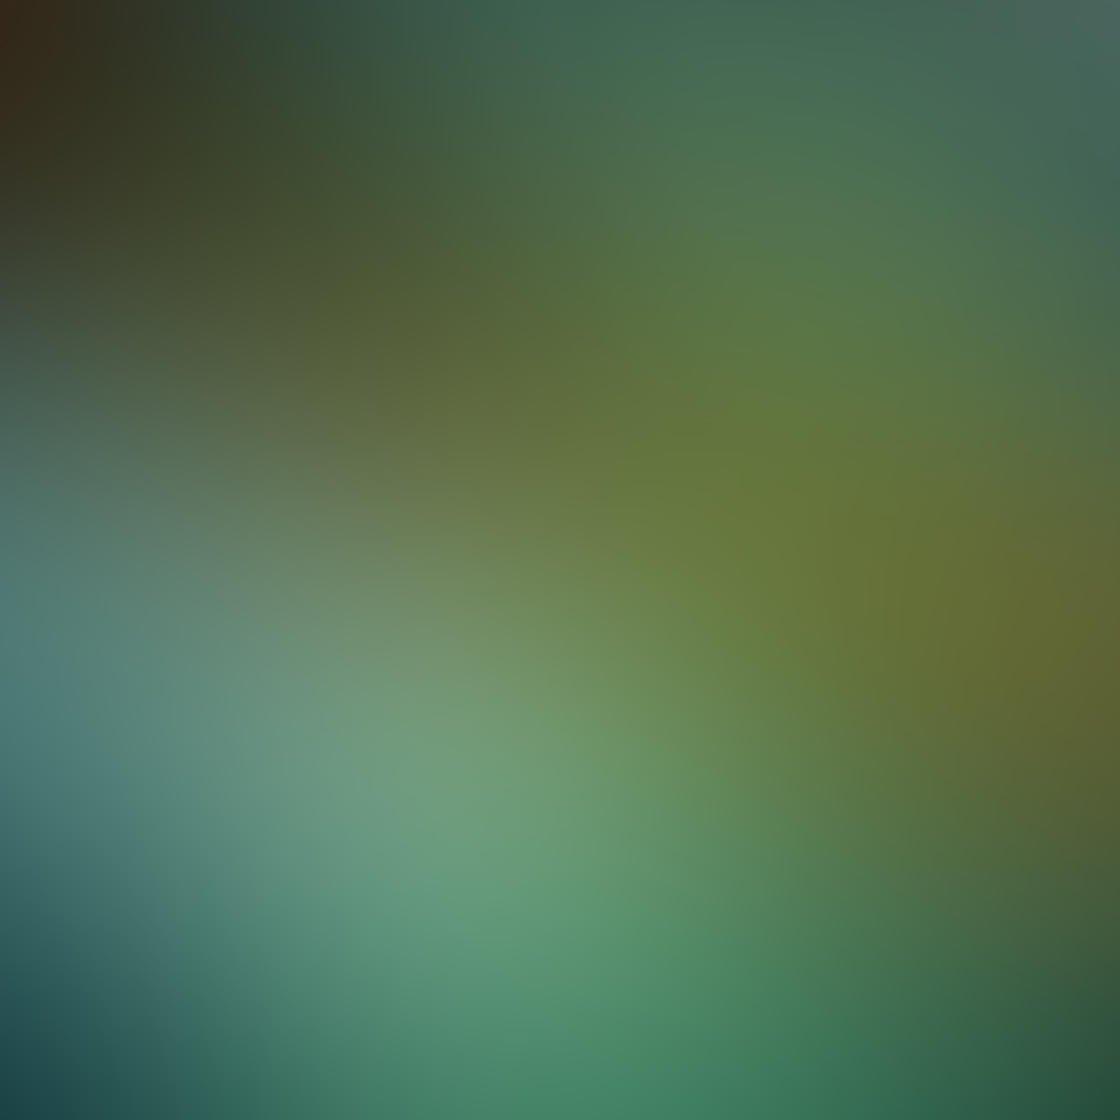 Ordinary iPhone Photo Subjects 16